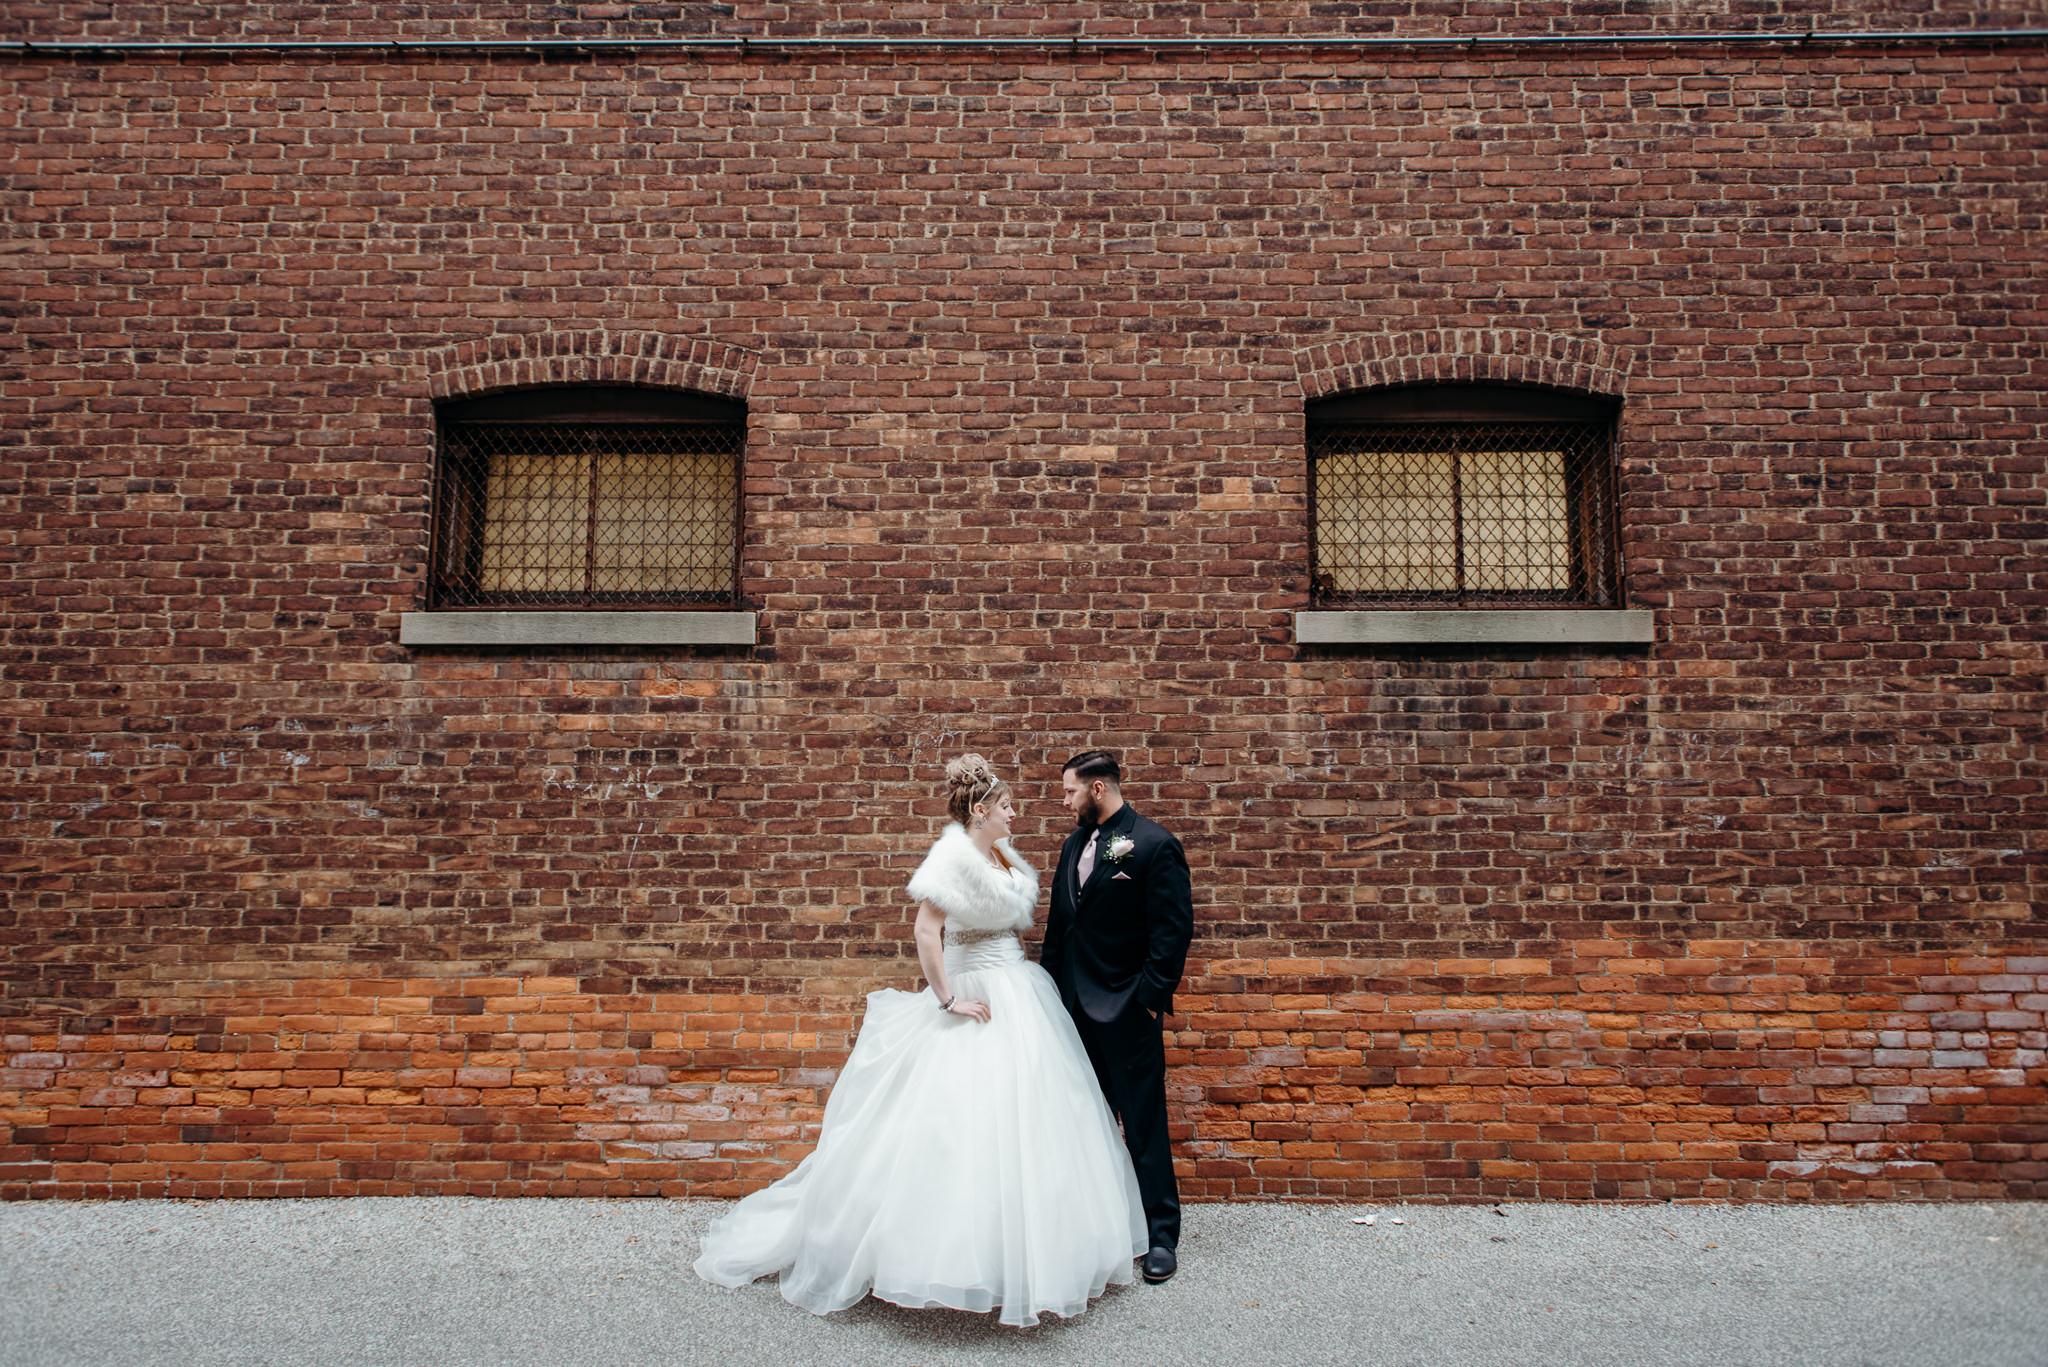 Grant Beachy Photo portrait wedding goshen elkhart south bend chicago-038.jpg